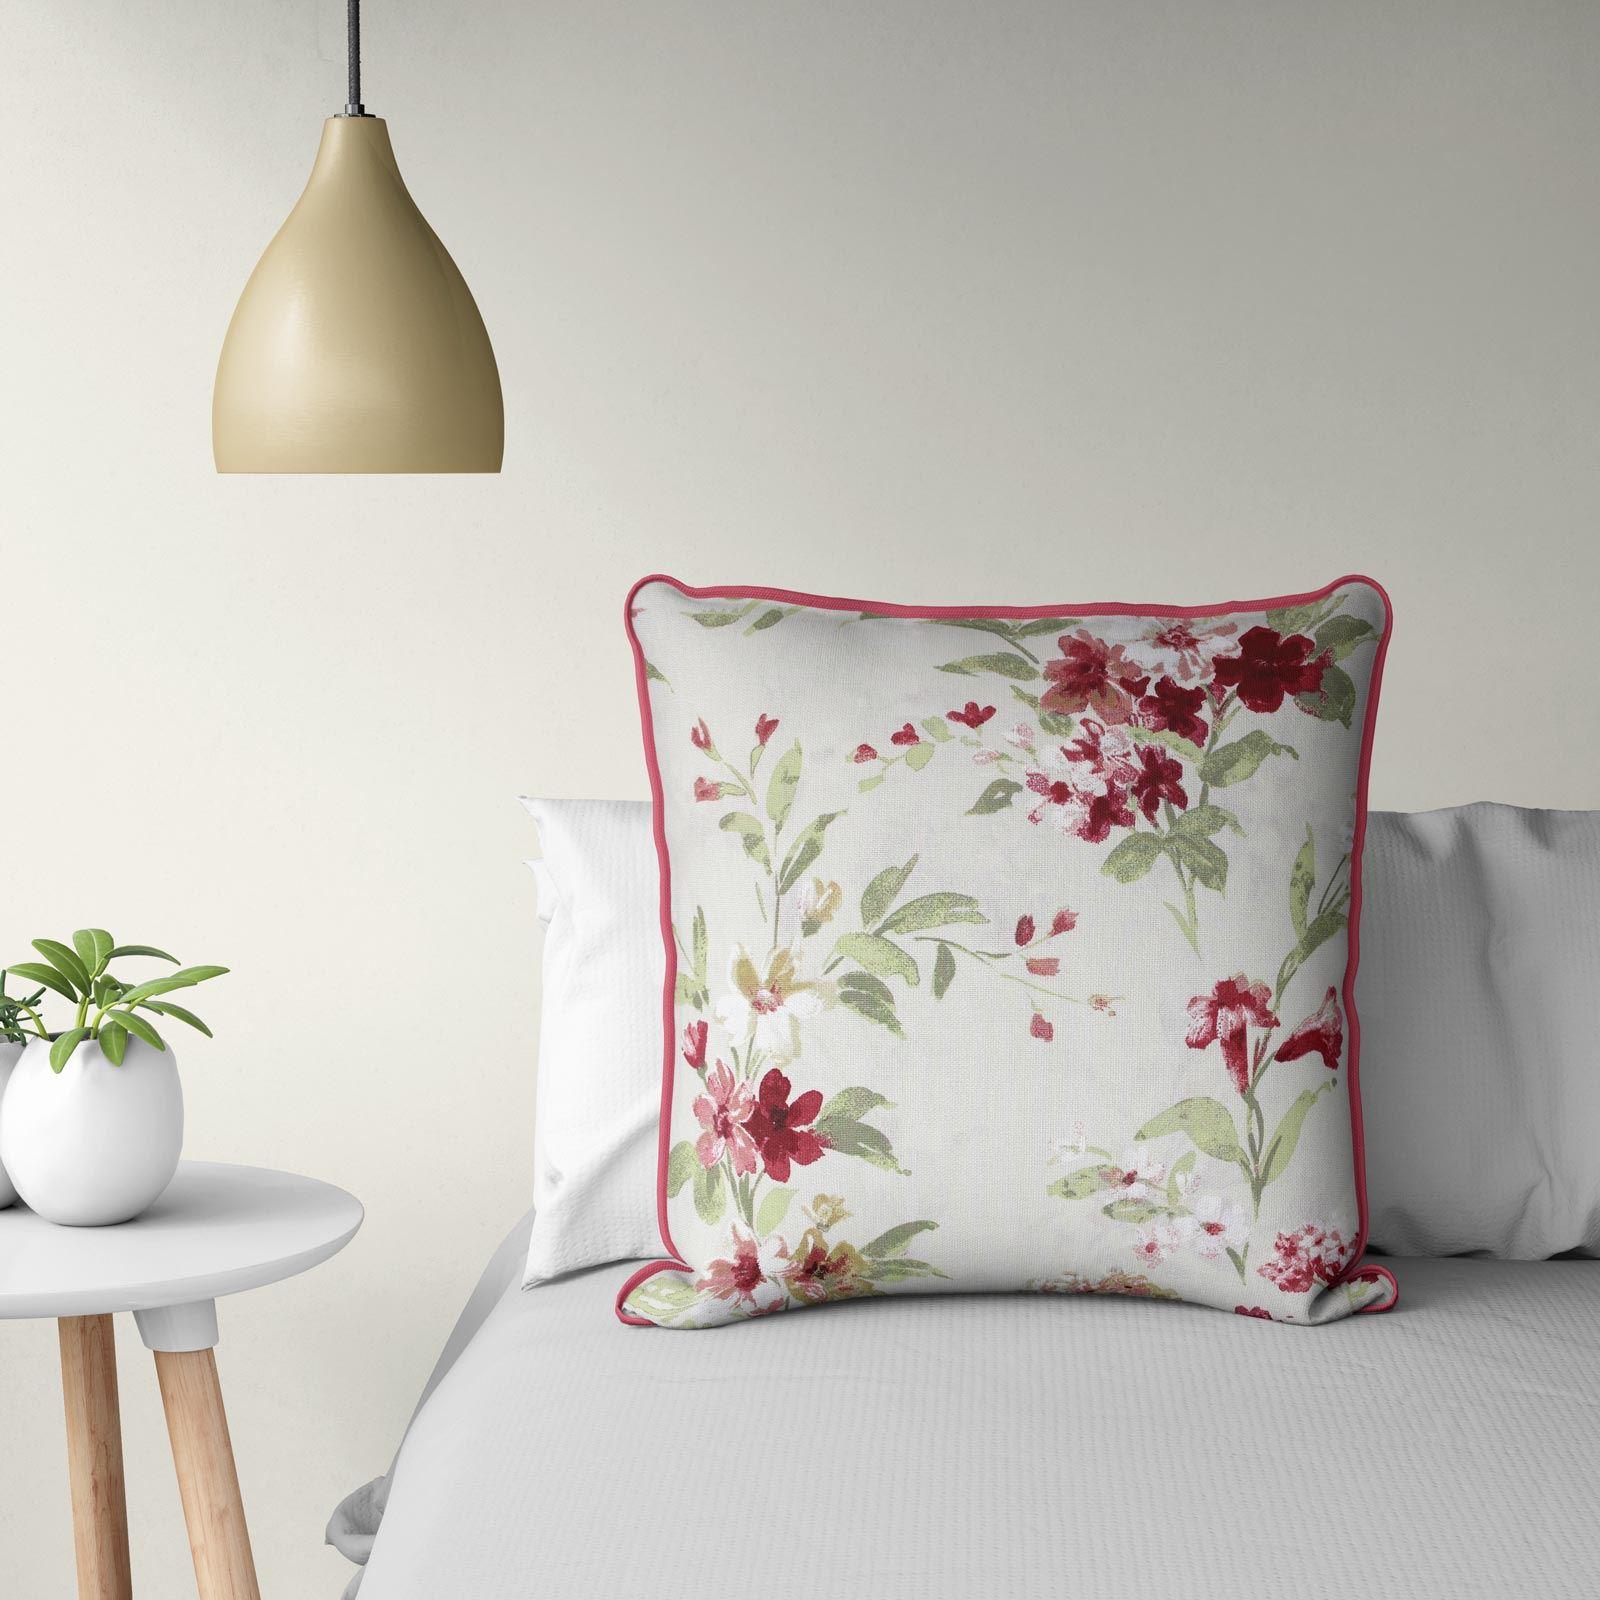 Vino-Tinto-Cushion-Covers-Coleccion-17-034-18-034-43cm-45cm-Cubierta miniatura 24